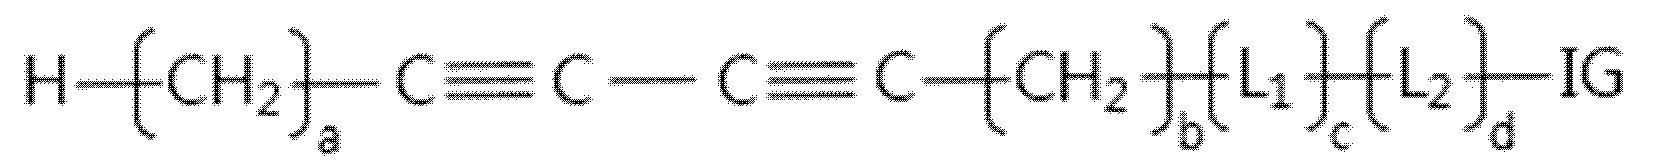 Figure PCTKR2016011399-appb-I000018